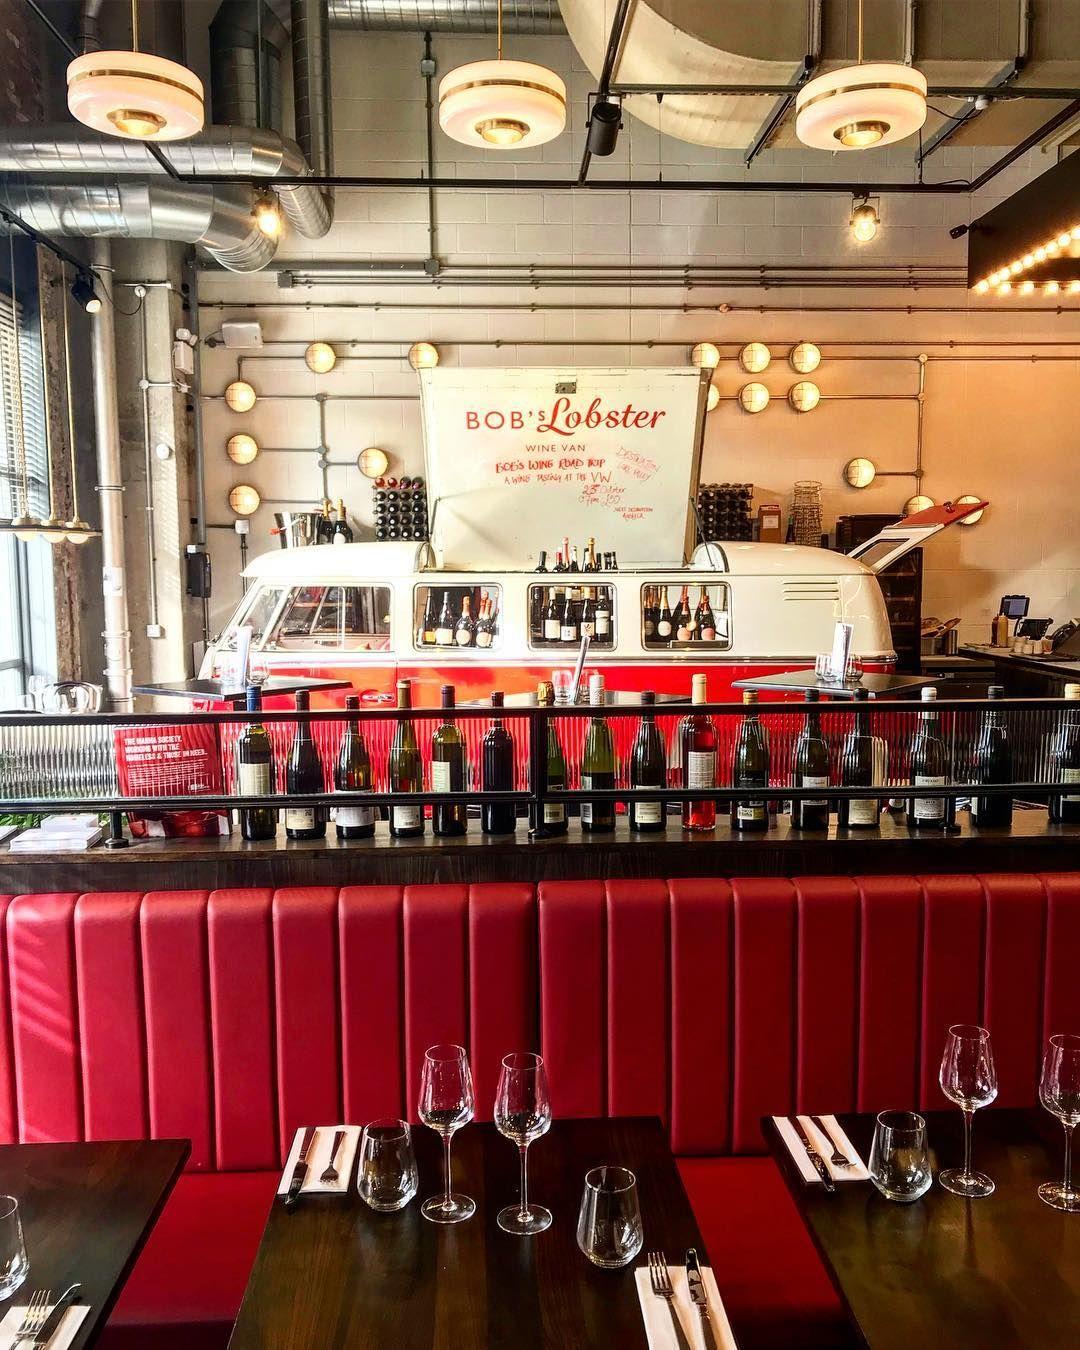 London Bridge Pubs And Bars 35 Lovely Spots For A Drink In 2020 Pub Pub Bar London Bridge